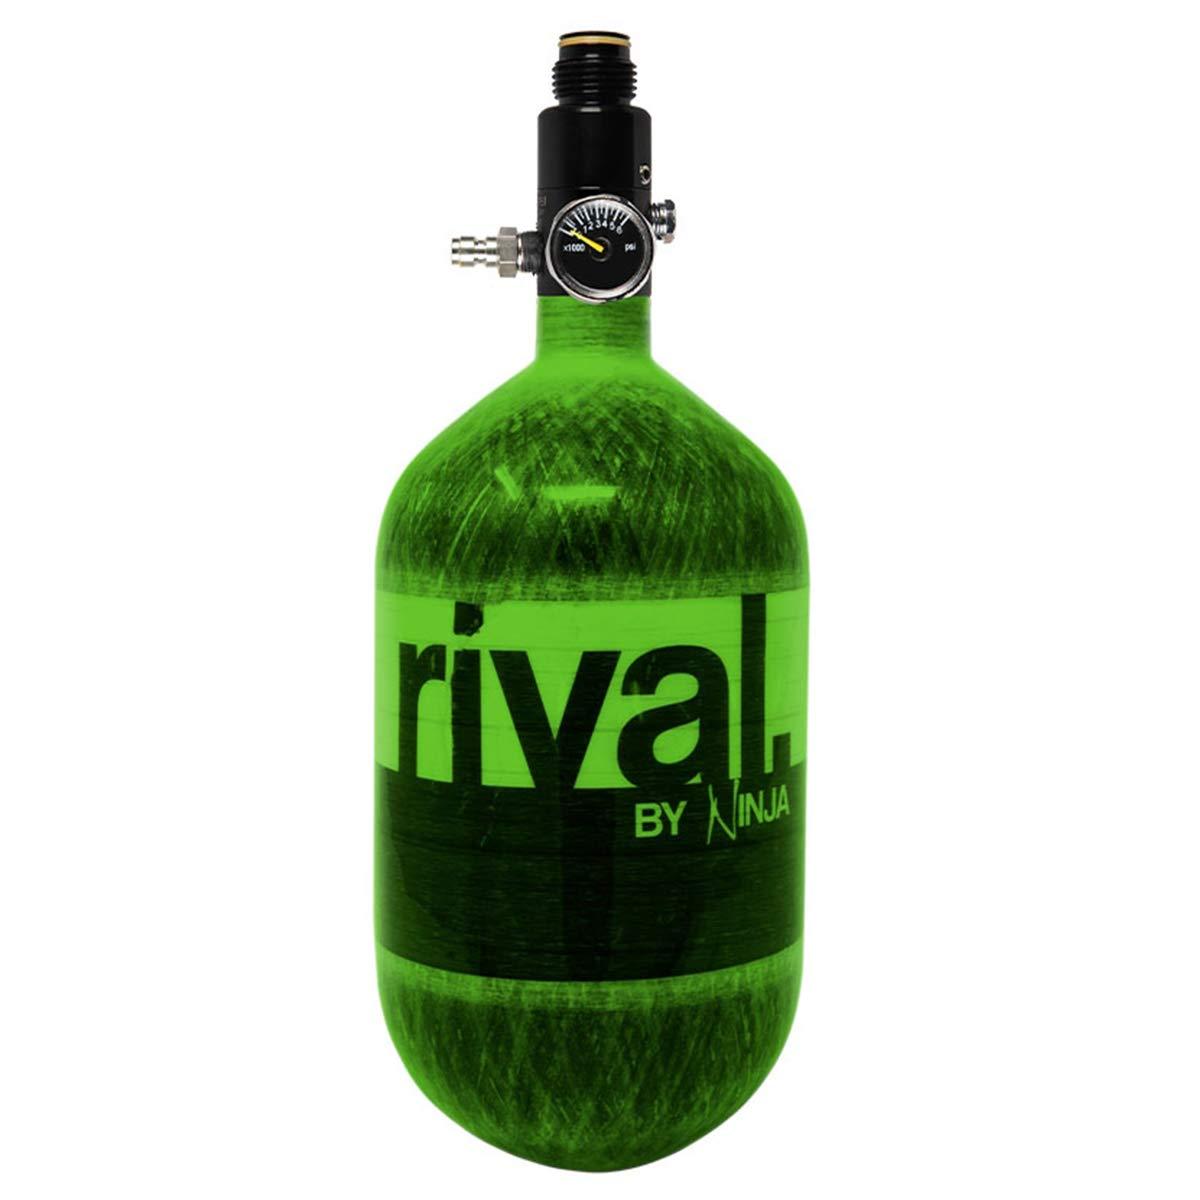 Ninja Rival Paintball Compressed HPA Air Tank (Lime) by Ninja Paintball